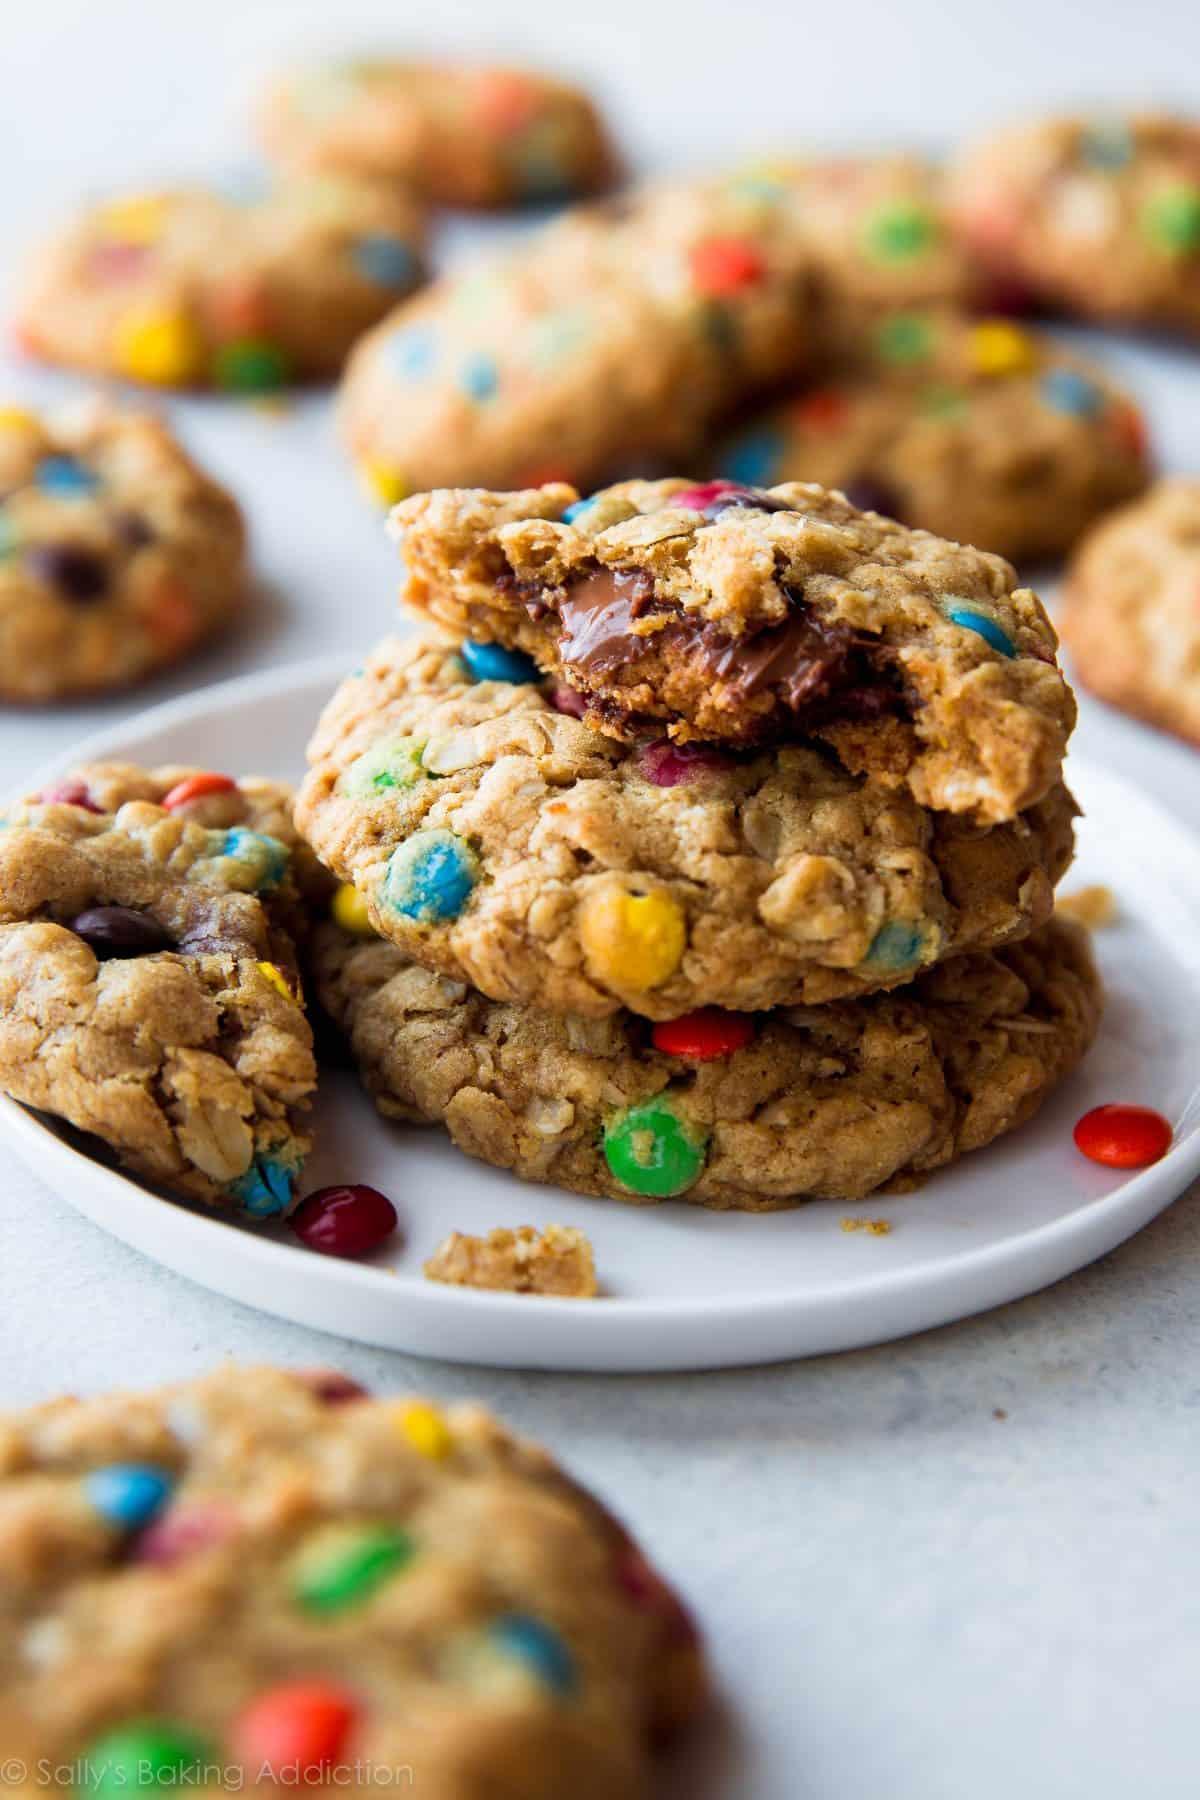 Peanut Butter Cup Surprise Monster Cookies - Sallys Baking Addiction